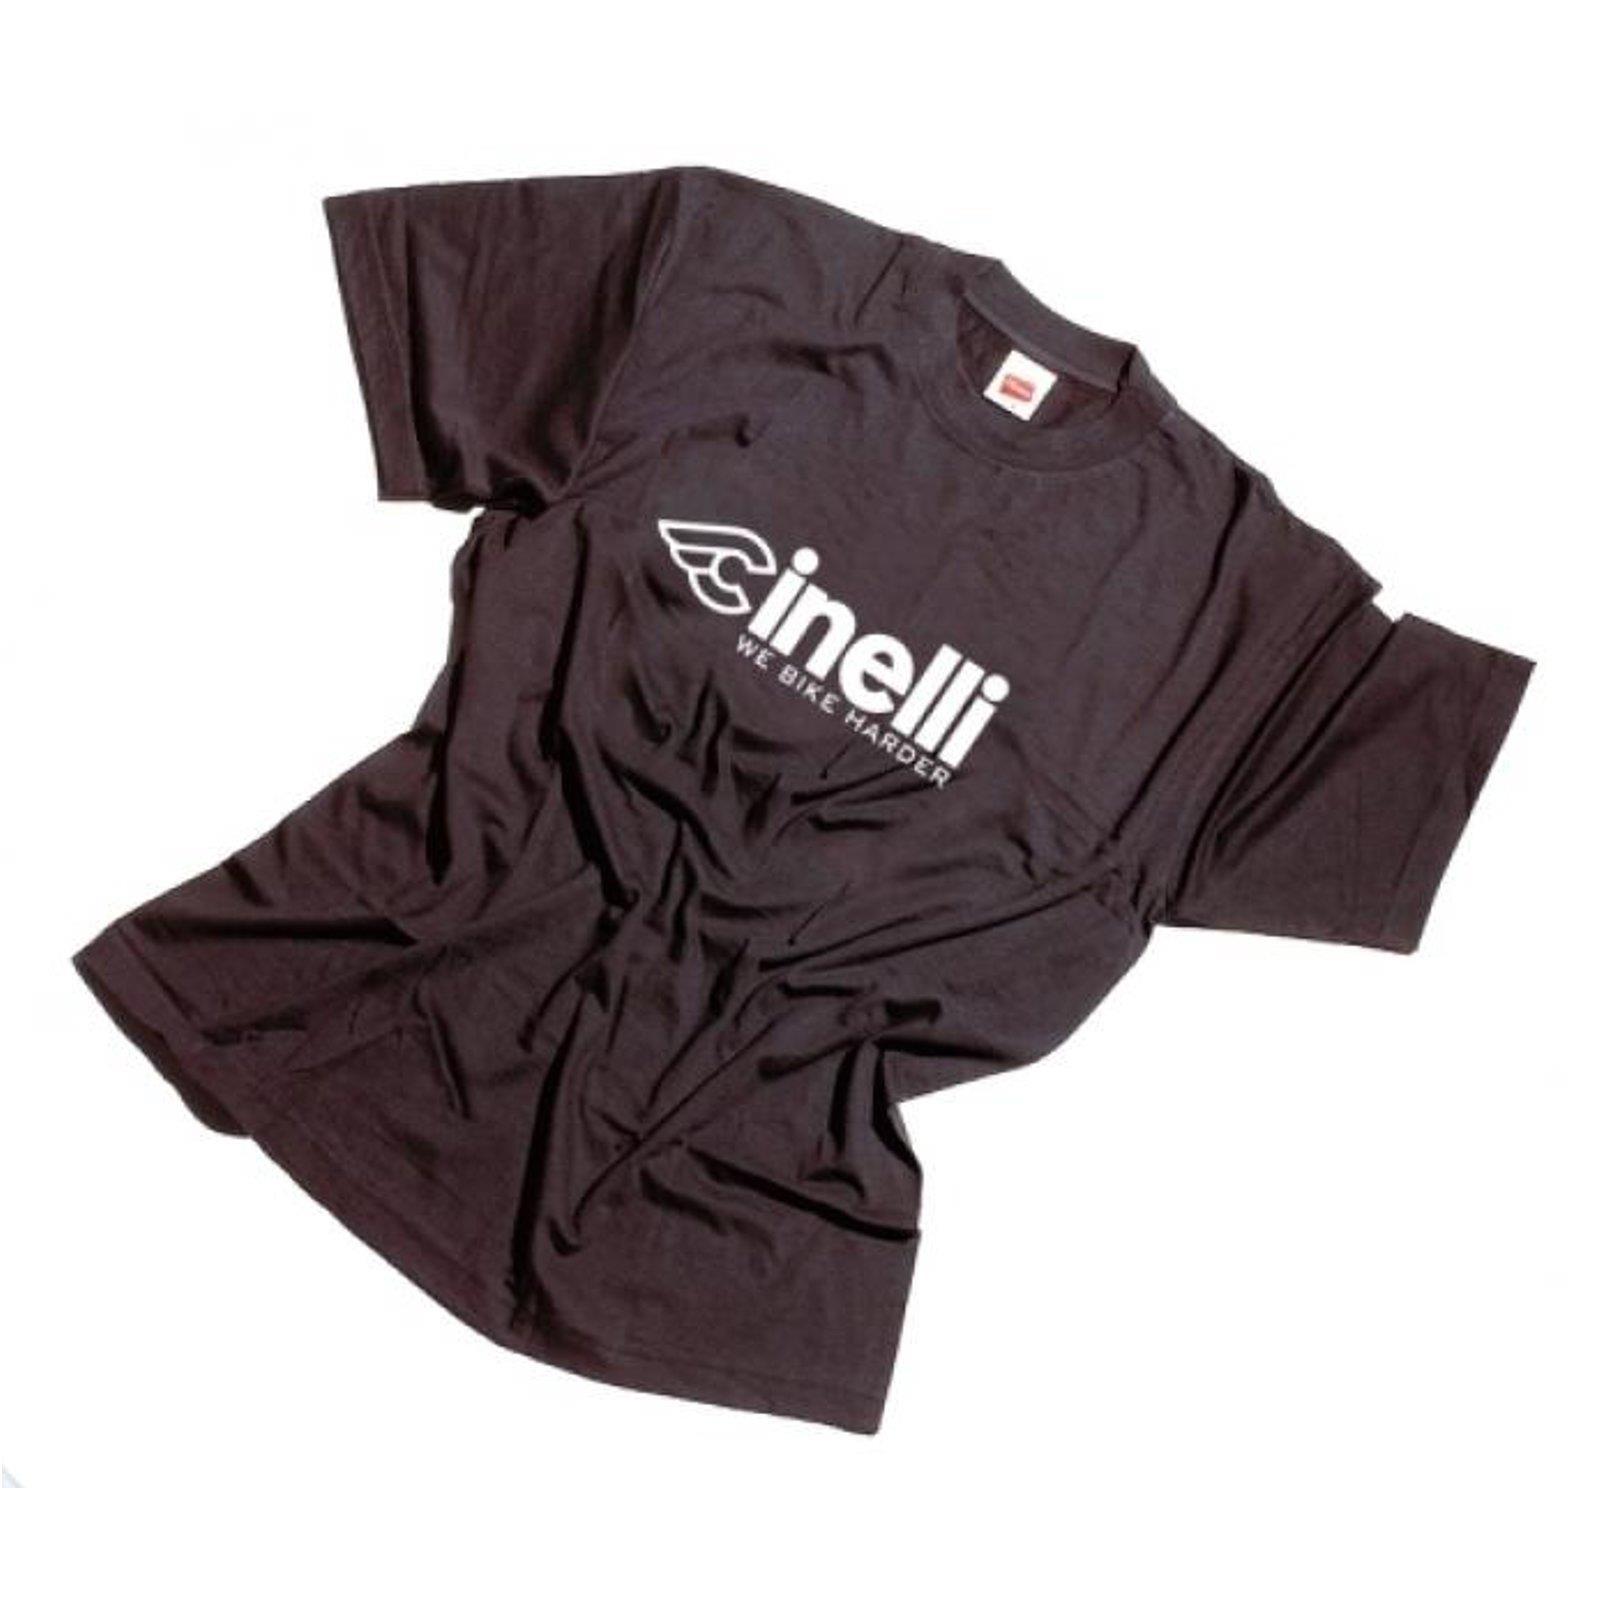 cinelli t shirt schwarz we bike harder original merchandise shirt top. Black Bedroom Furniture Sets. Home Design Ideas